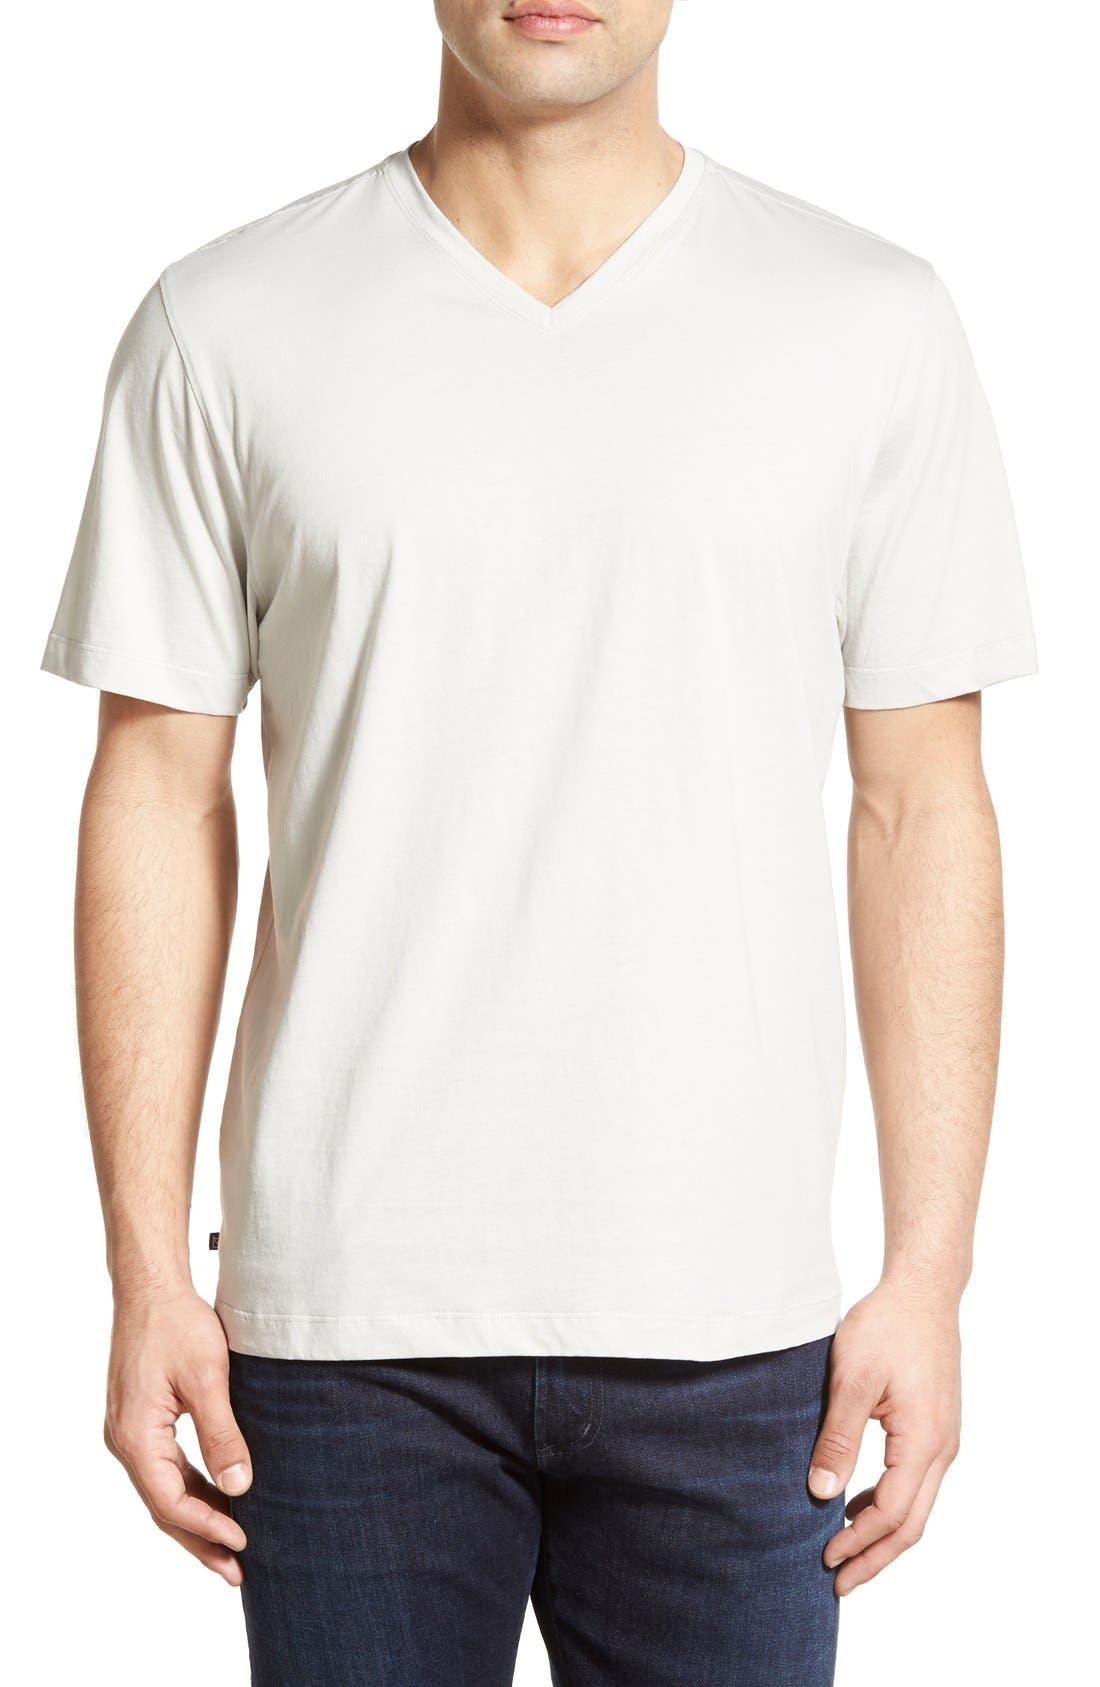 Main Image - Cutter & Buck Sida V-Neck T-Shirt